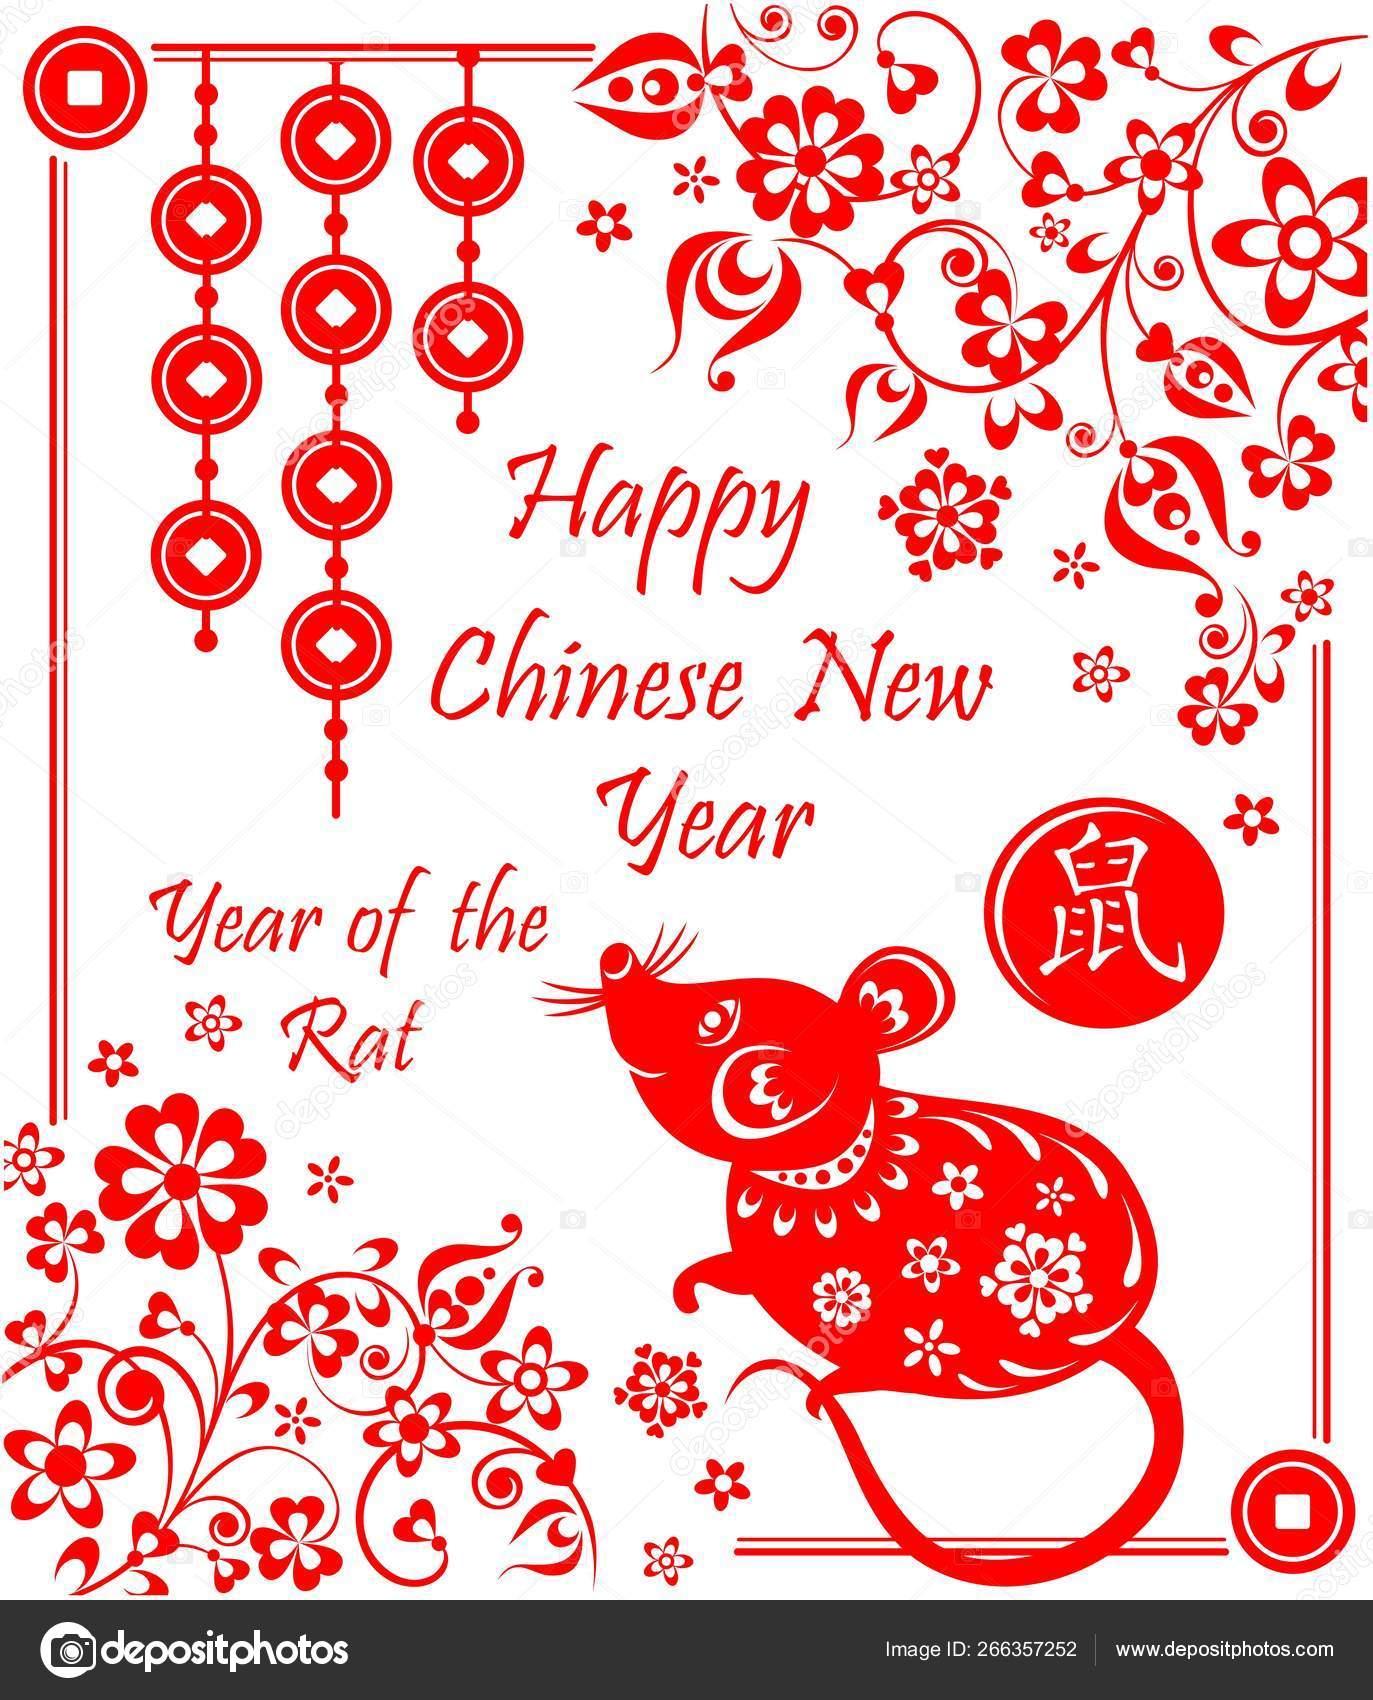 Chinese New Year 2020 Animal.Happy Chinese New Year 2020 Year Rat Greeting Decorative